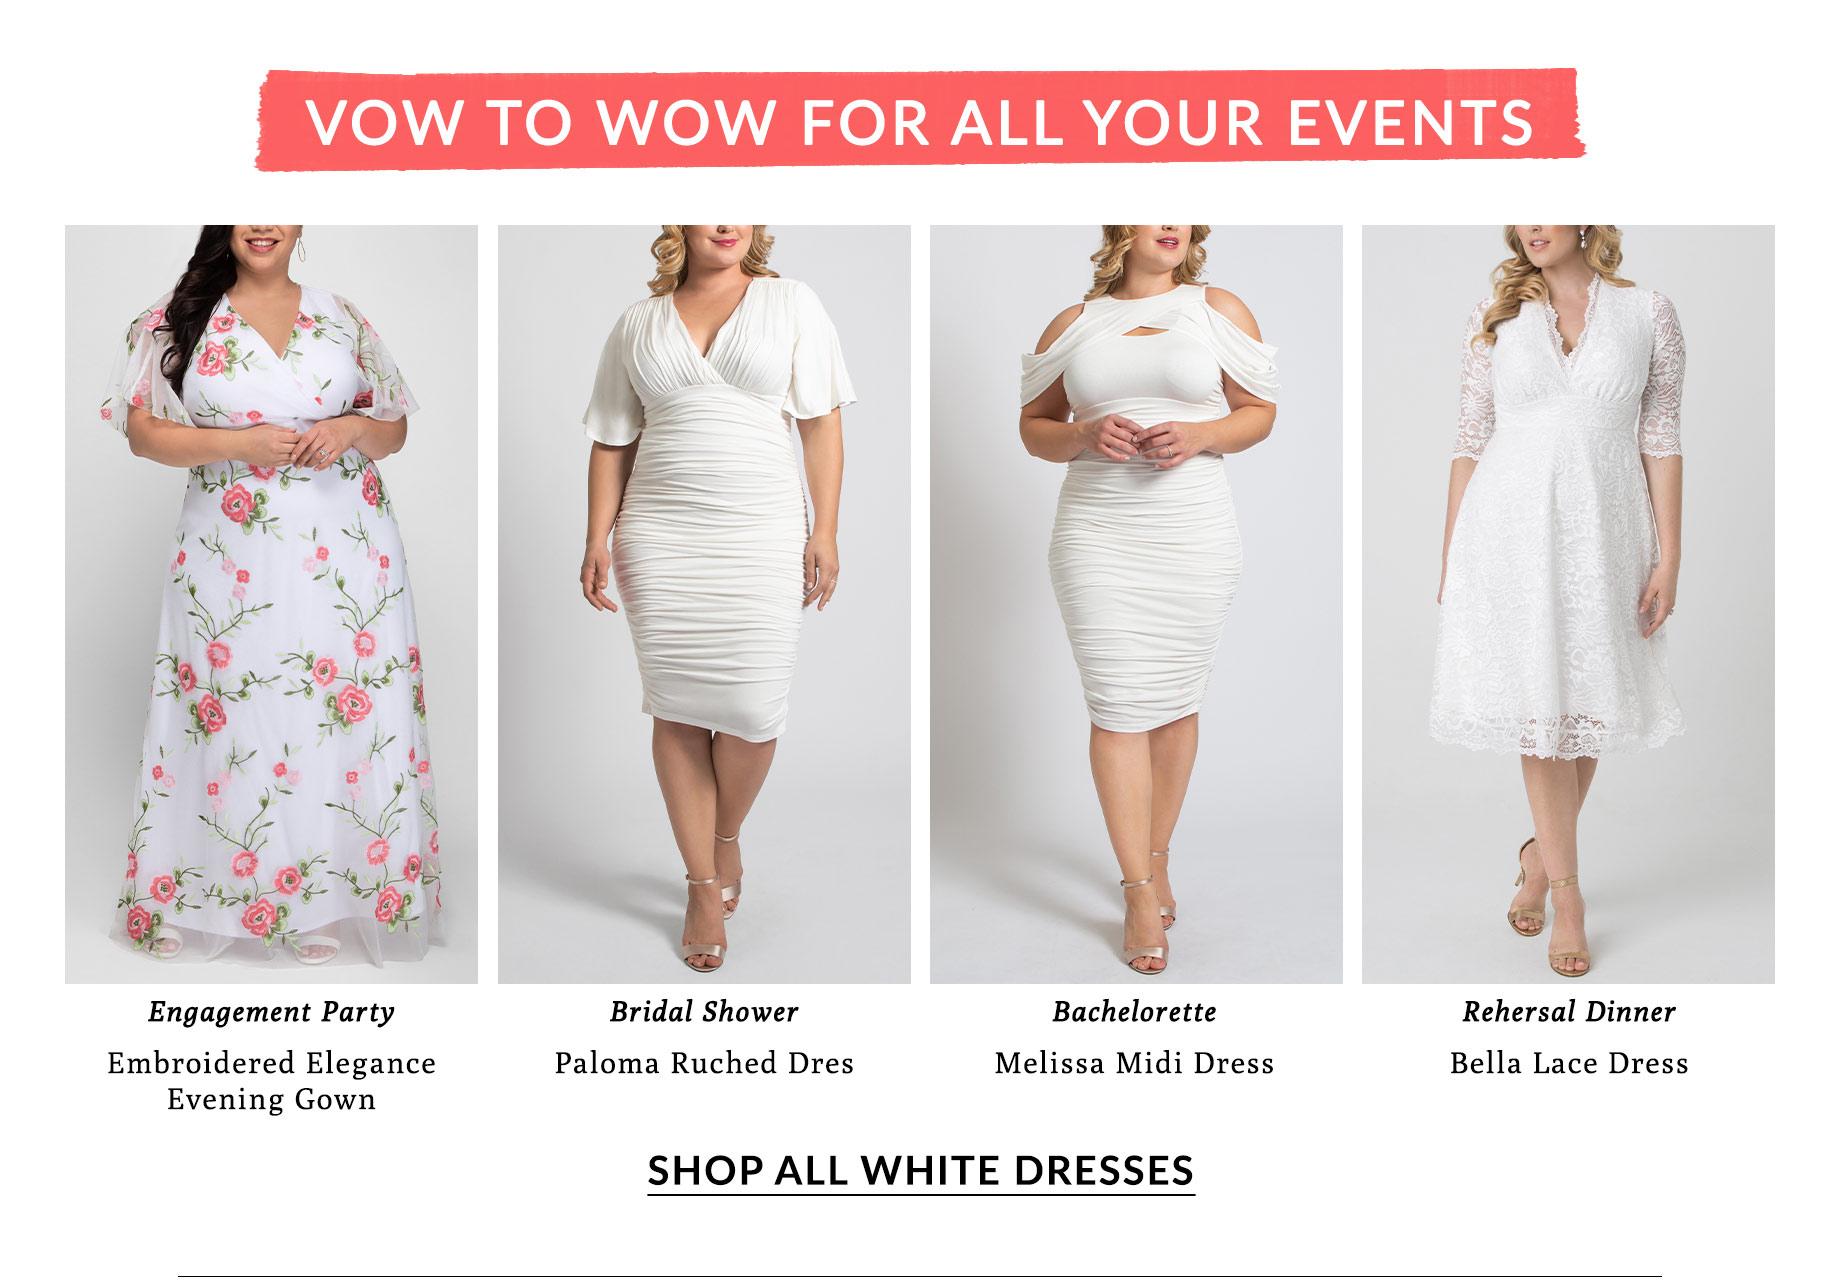 Shop All White Dresses